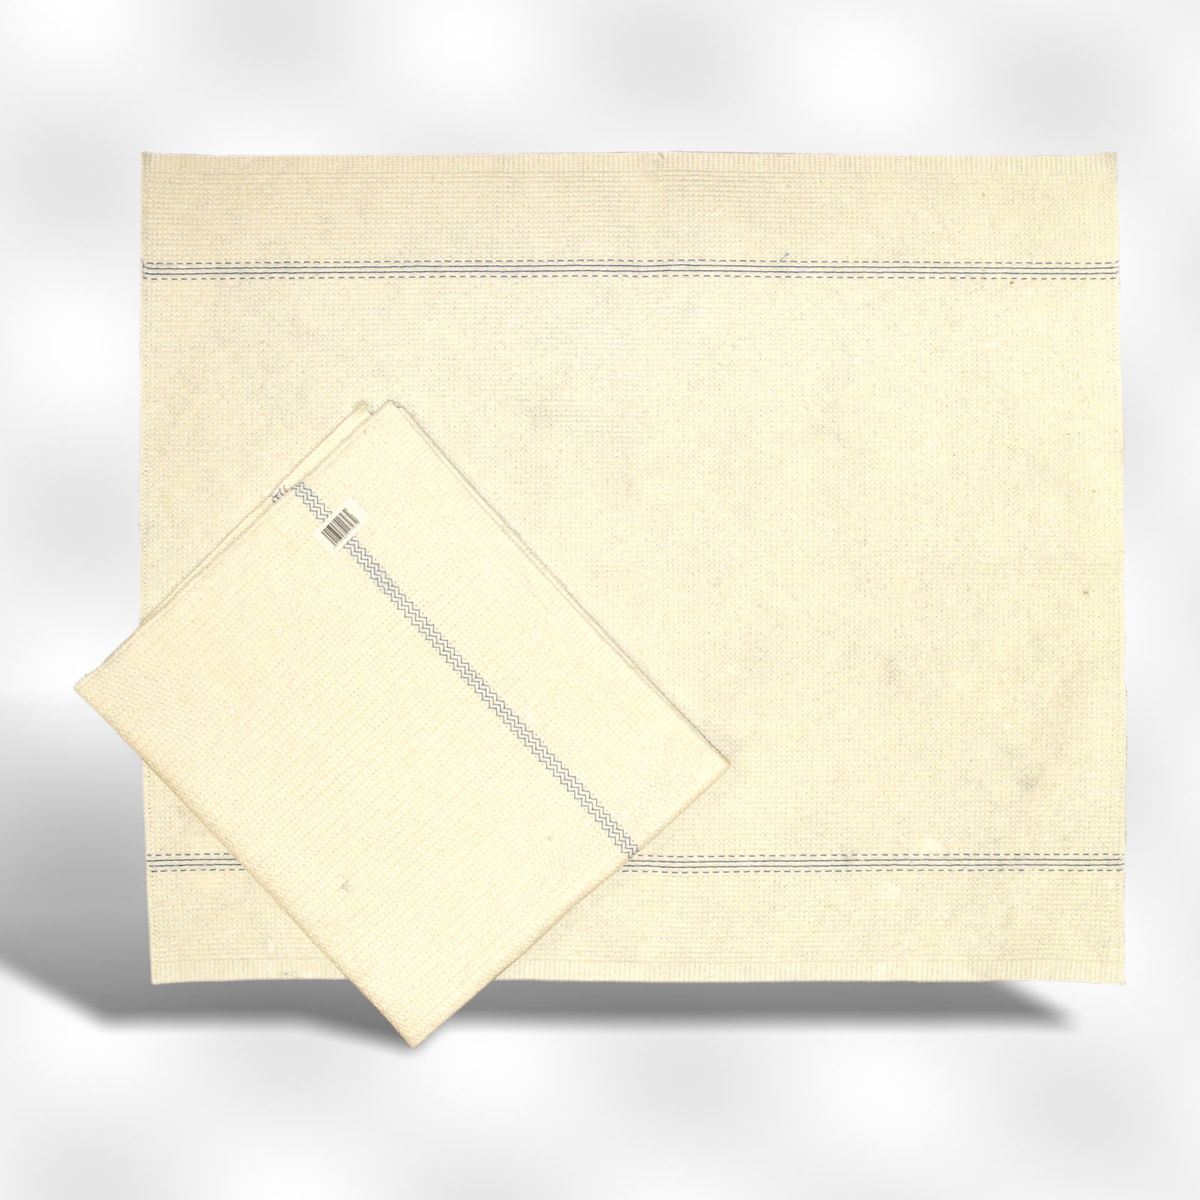 Dweil katoen gestikt - 60 x 70 cm - 3 stuks kopen